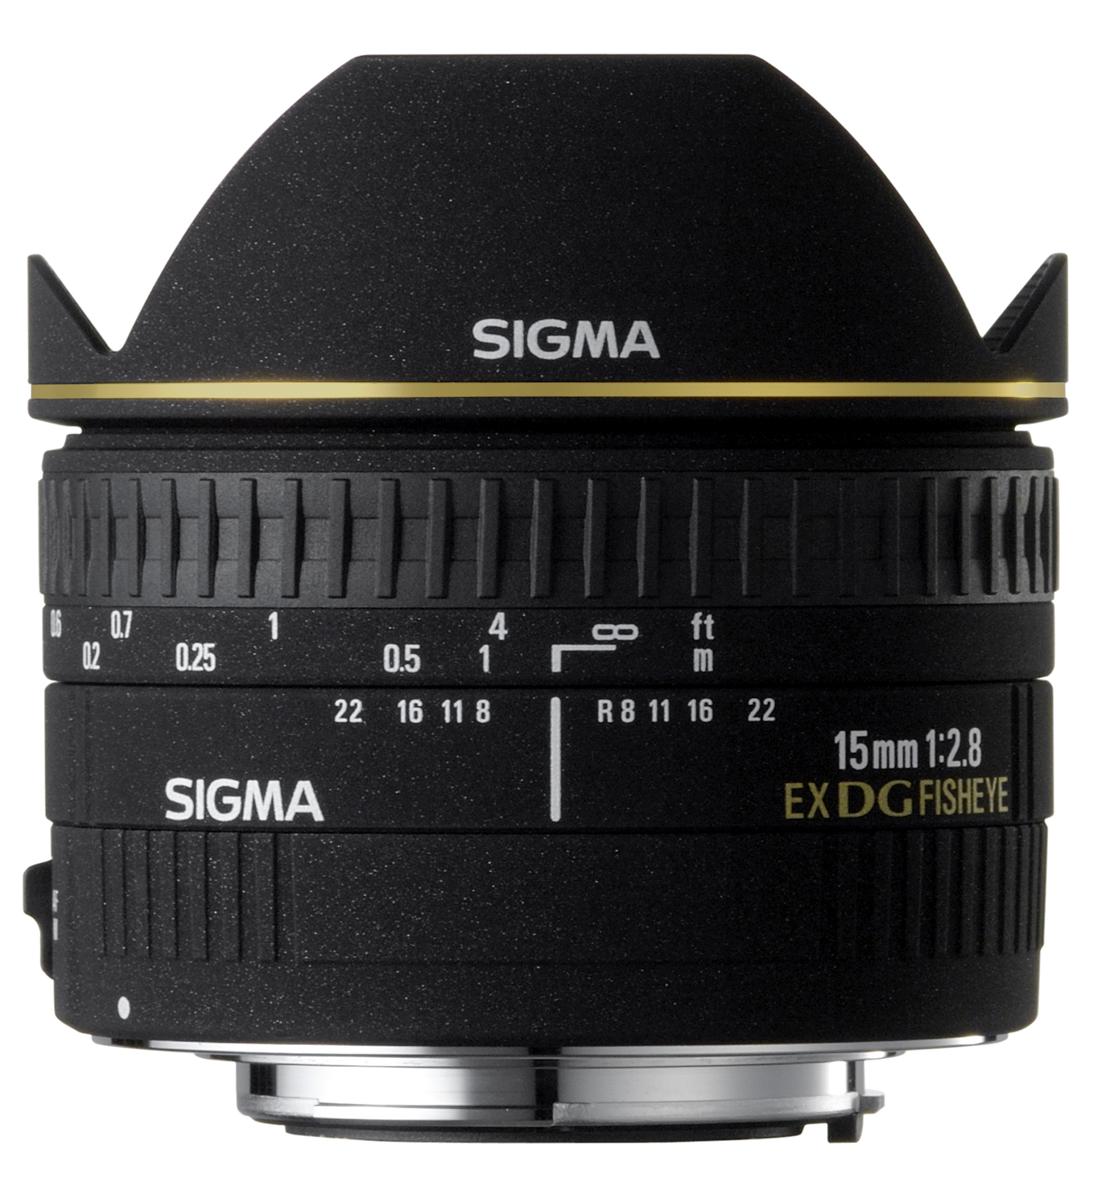 fisheye Sigma 15mm f2.8 EX DG